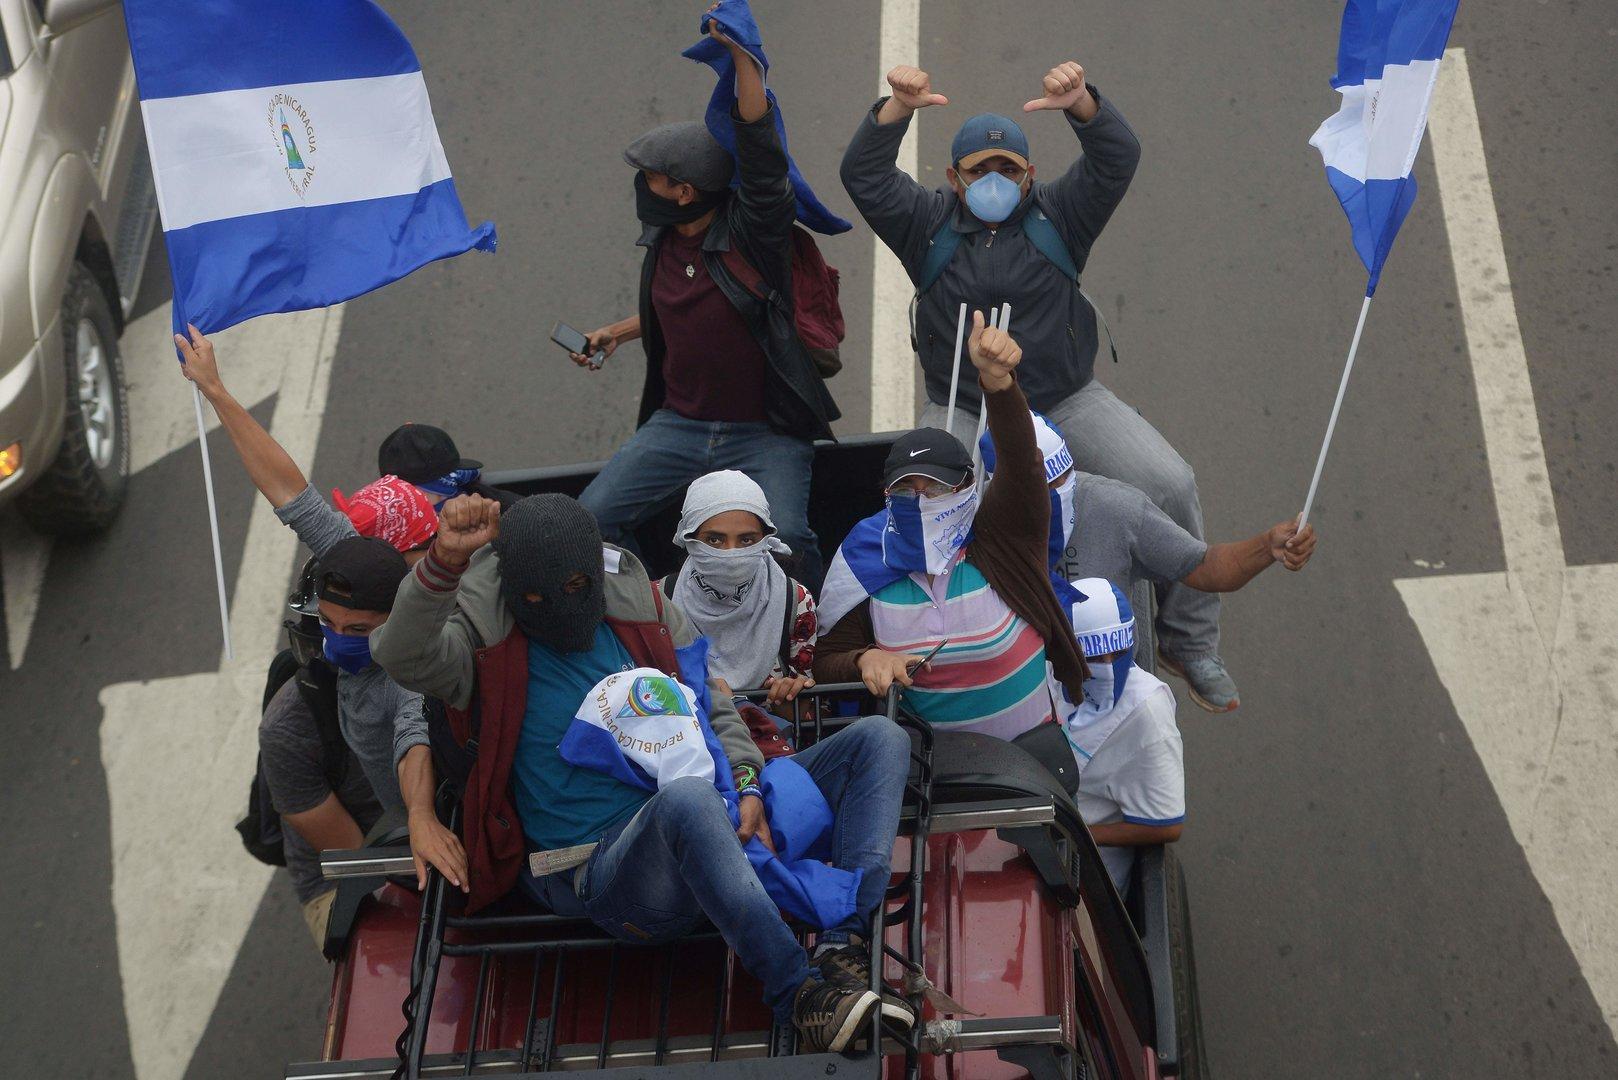 Erneut zehn Tote bei Auseinandersetzungen in Nicaragua